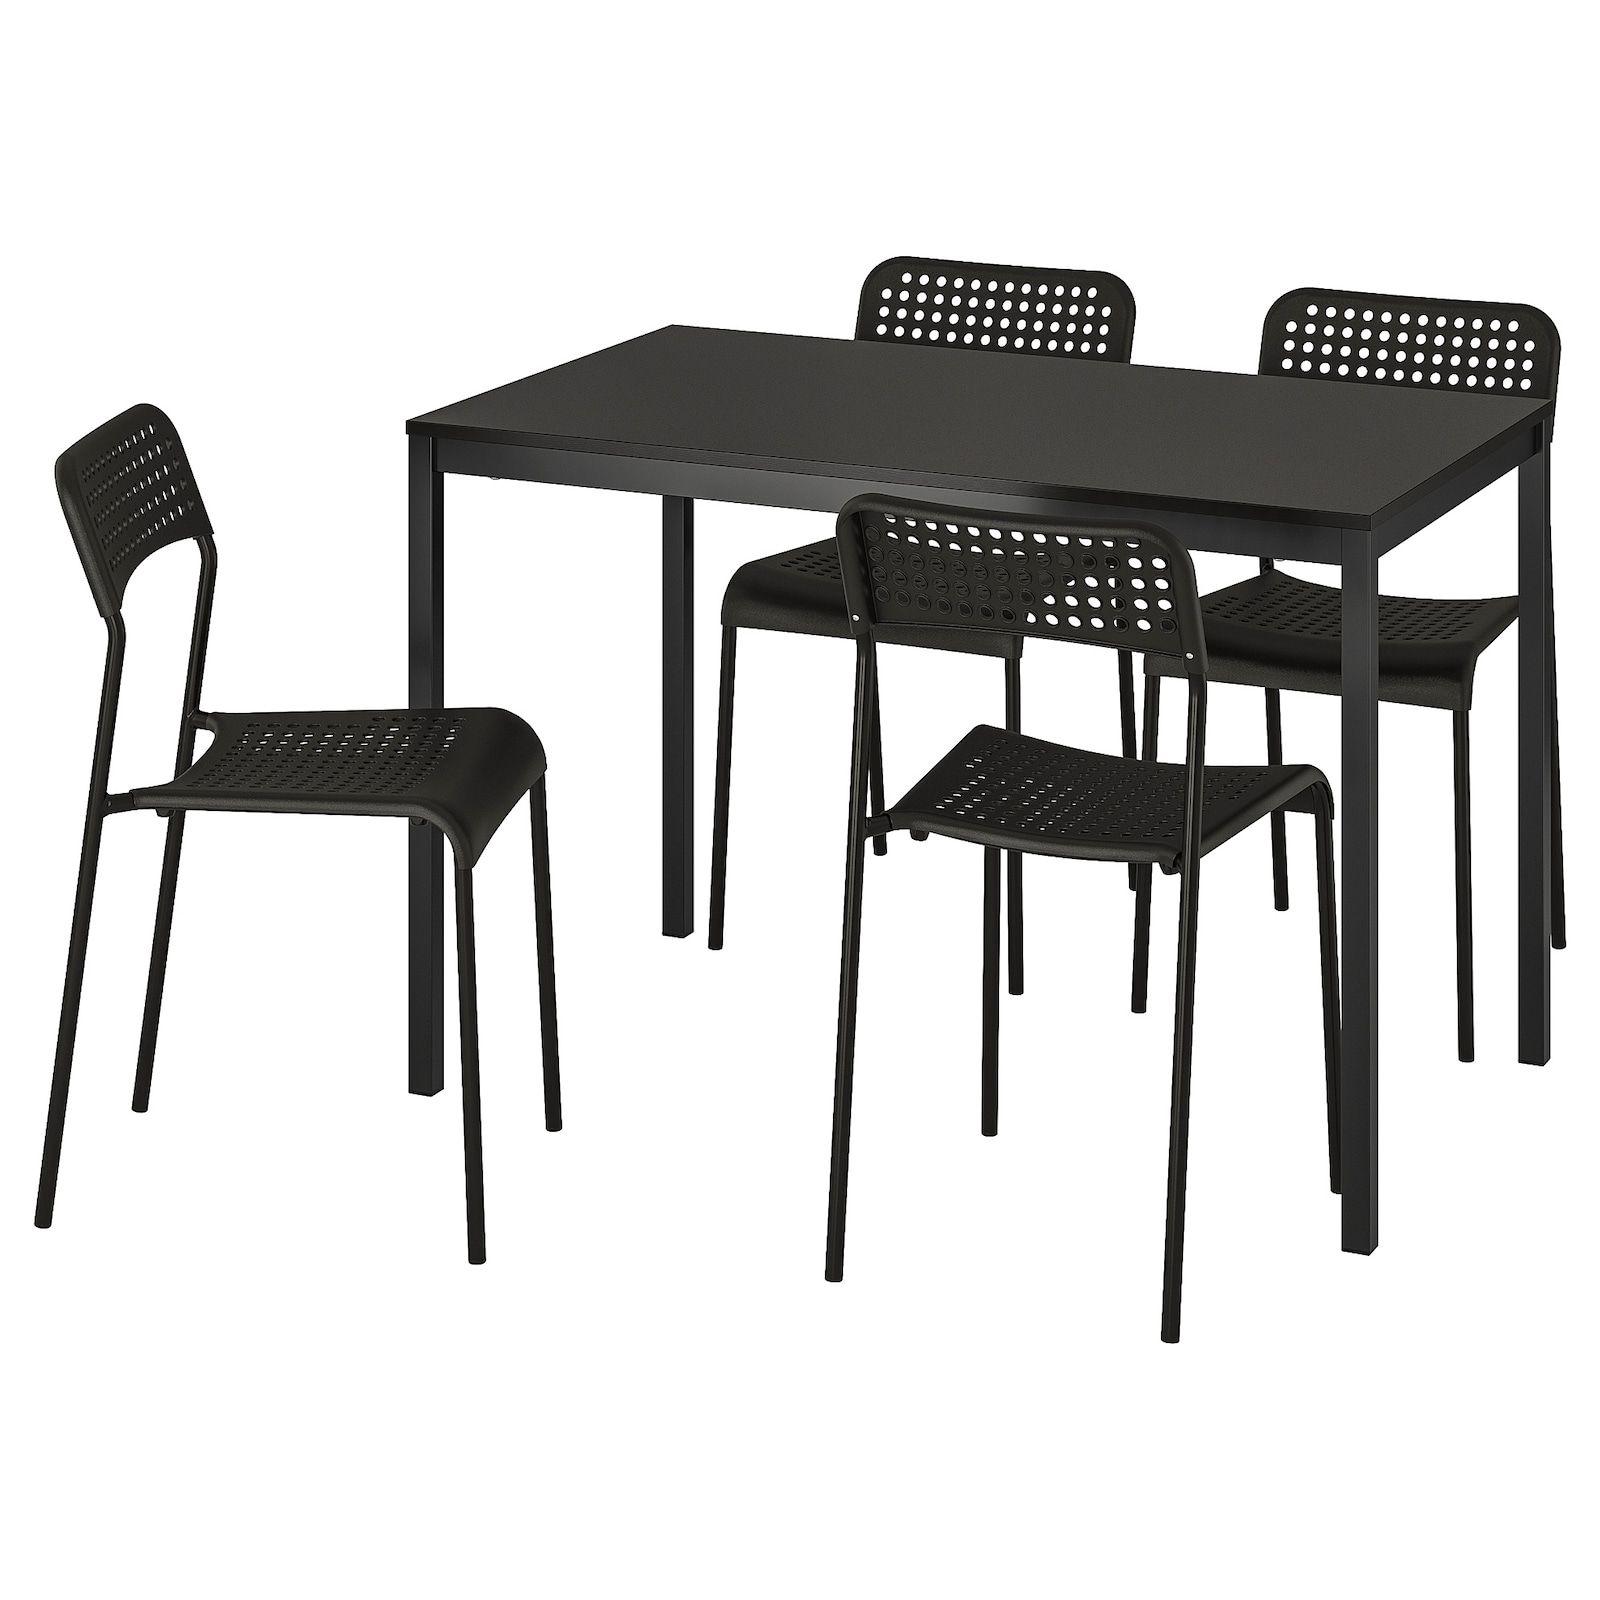 TÄRENDÖ ADDE Table and 4 chairs, black IKEA in 2020